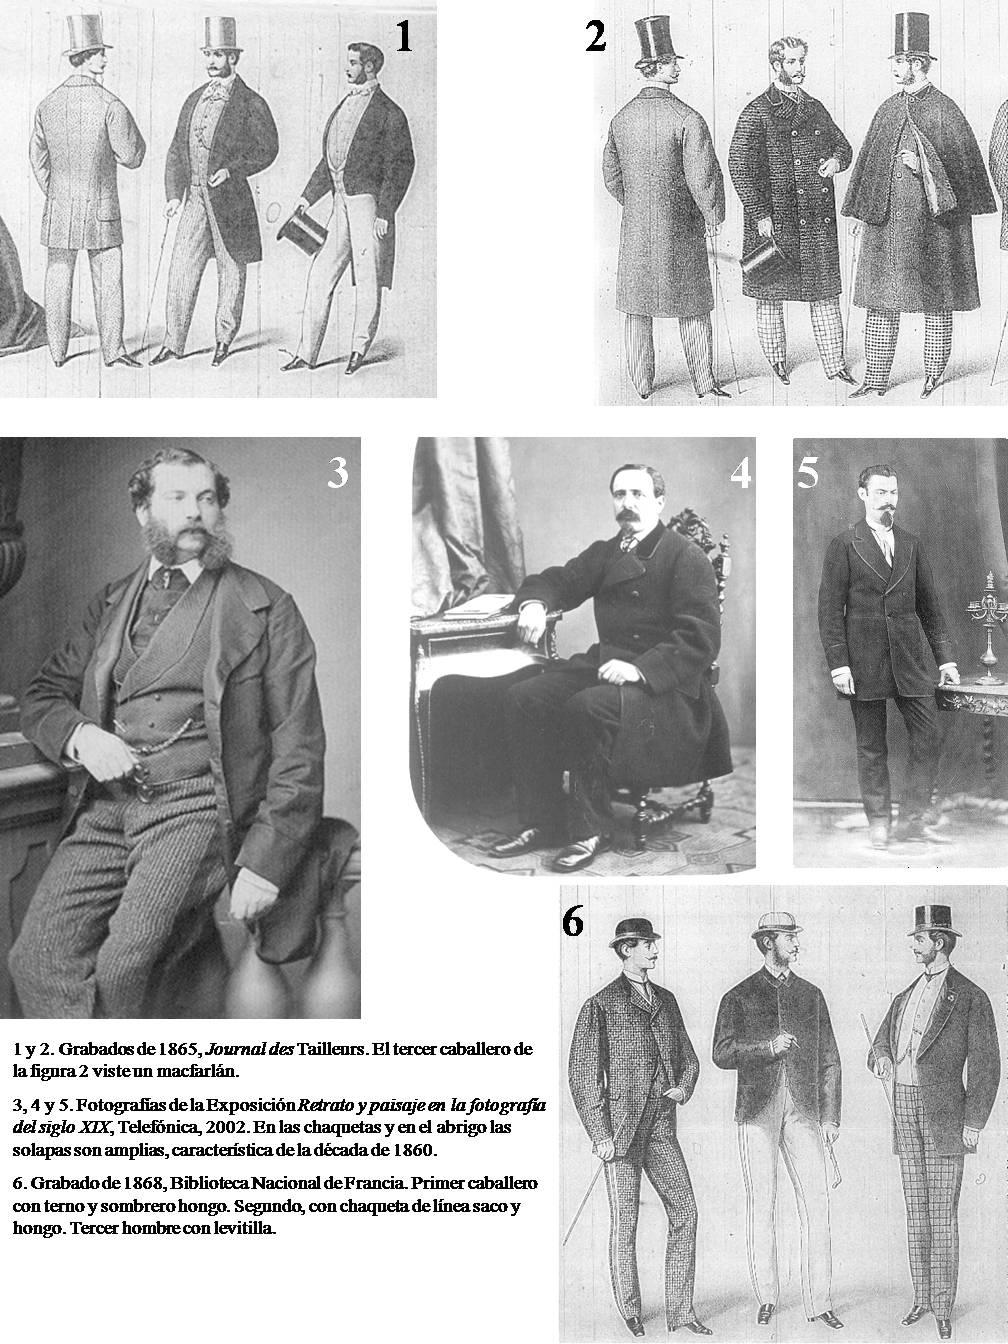 Siglo Capítulo 23 Traje Masculino Historia Xix El Traje Del En 1wHAqA